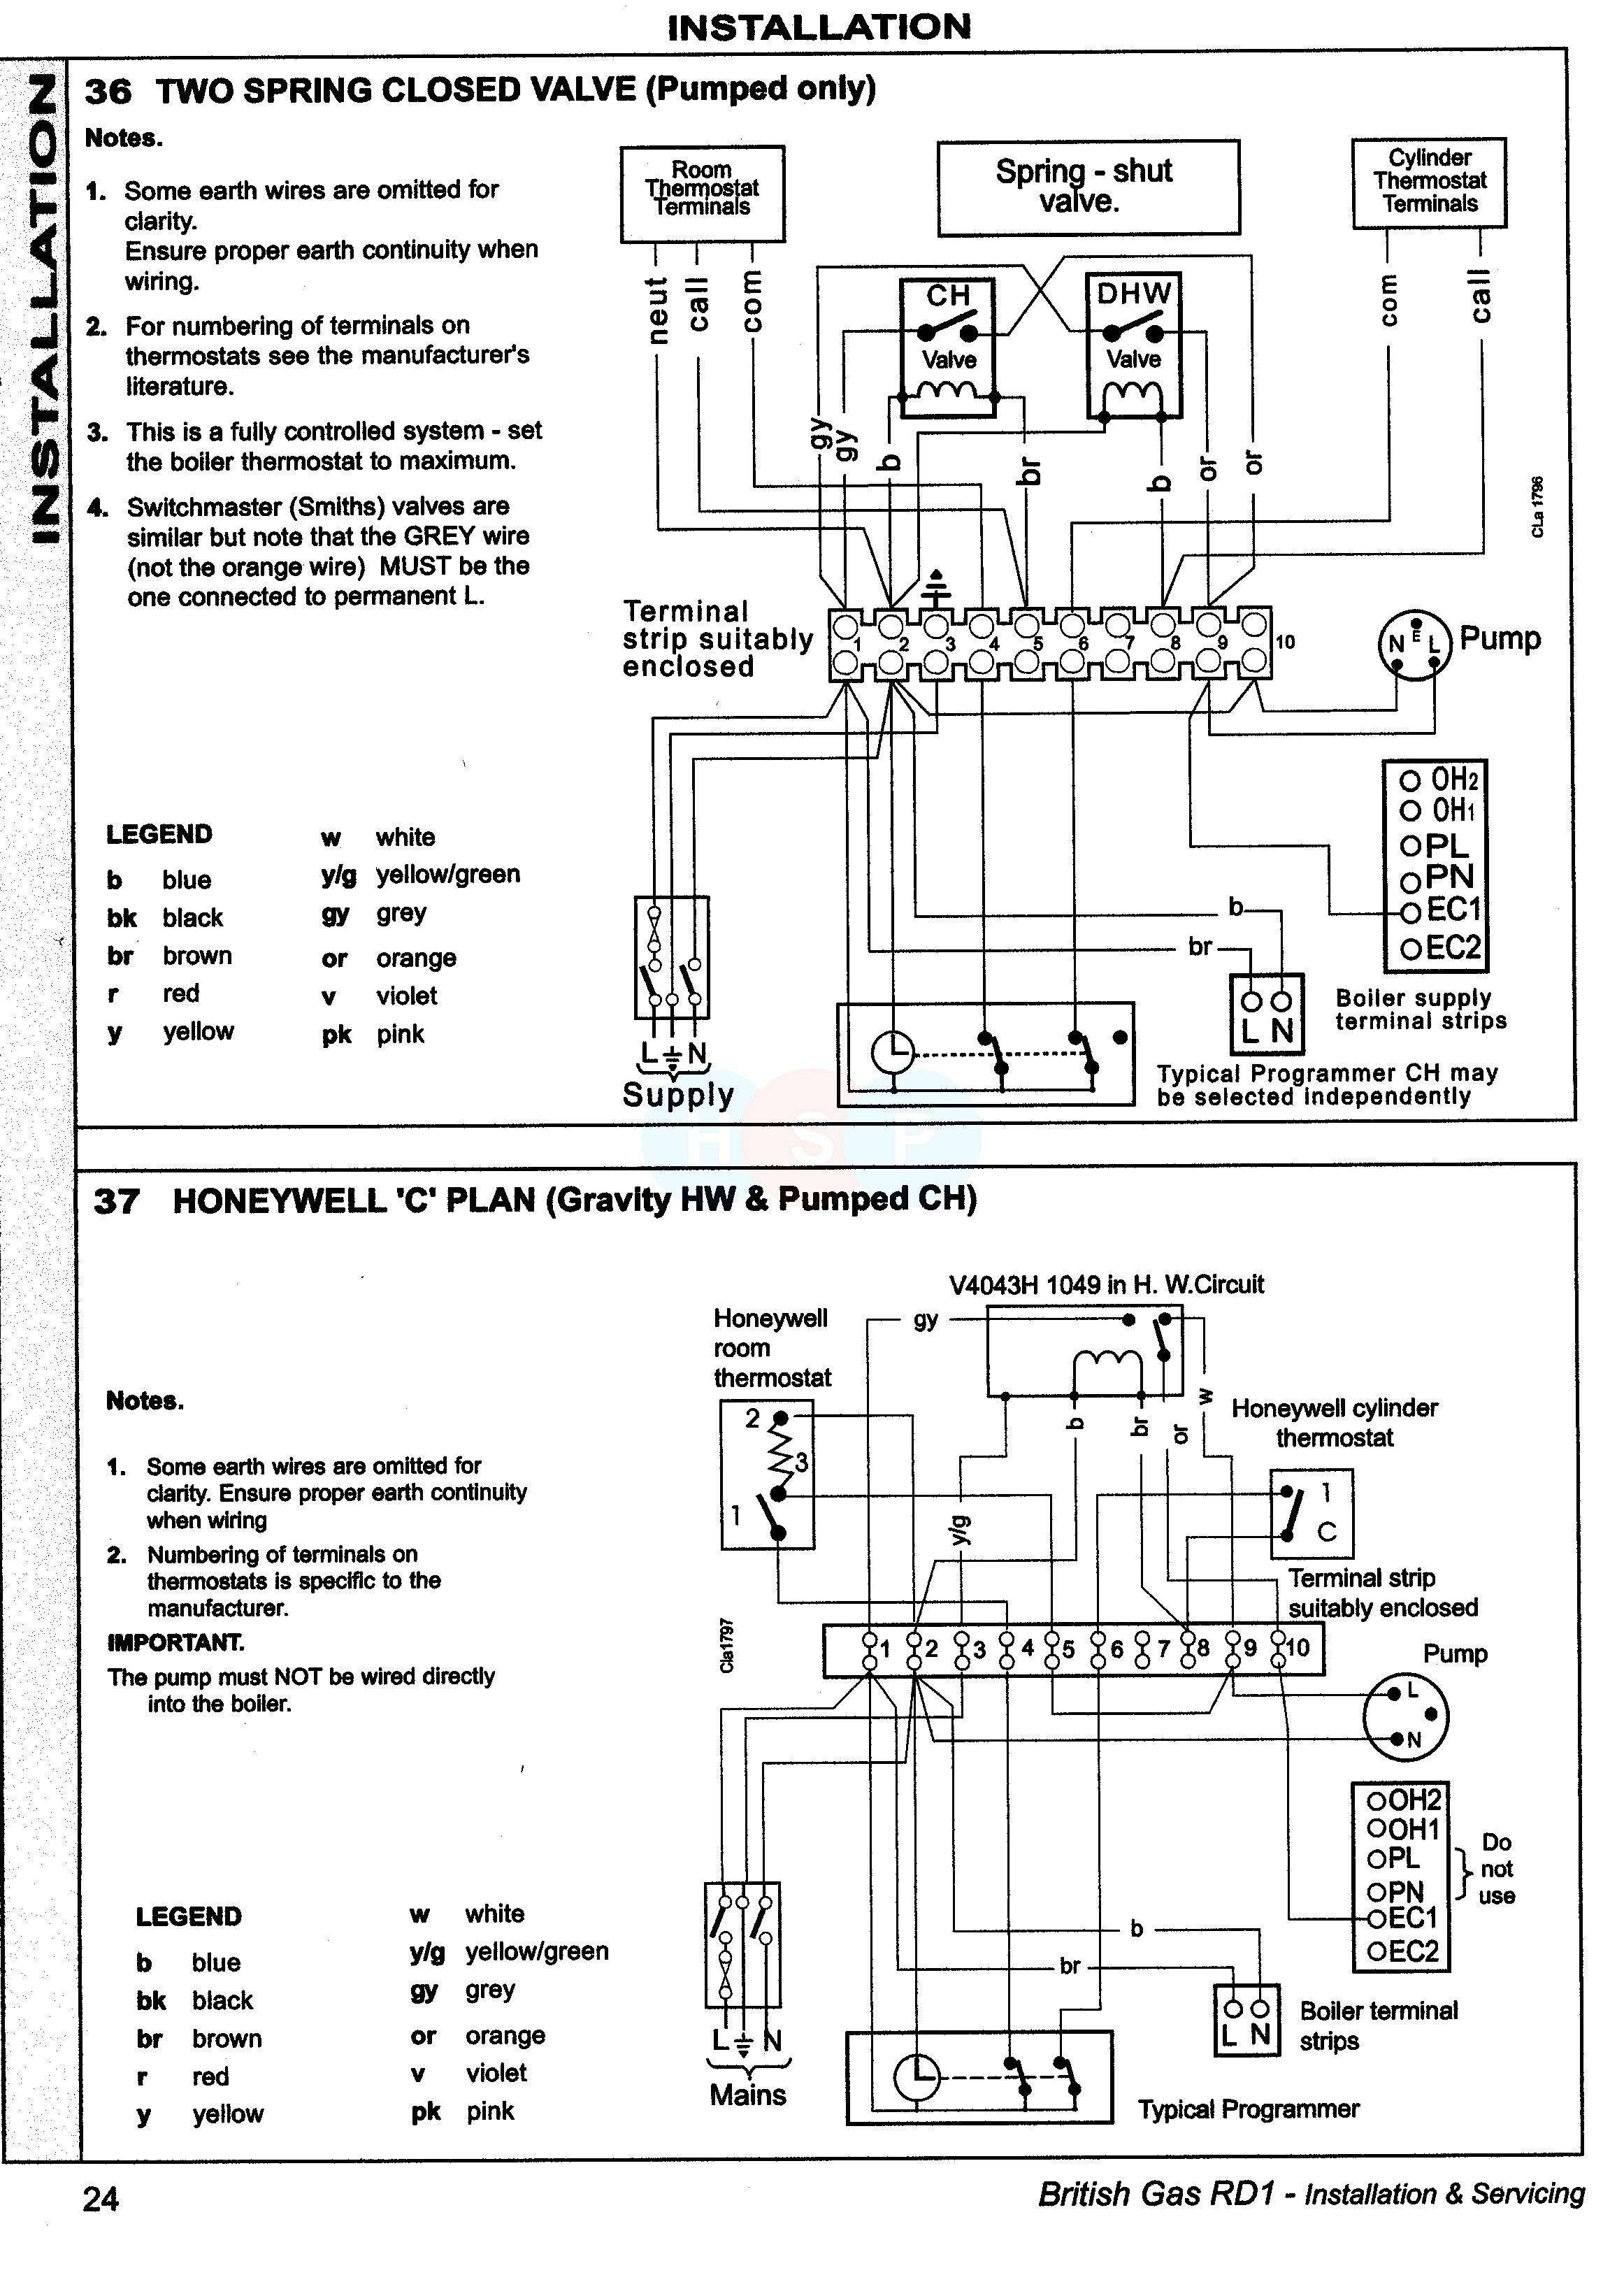 lovely wiring diagram for honeywell s plan diagrams digramssample diagramimages wiringdiagramsample  [ 2323 x 3254 Pixel ]